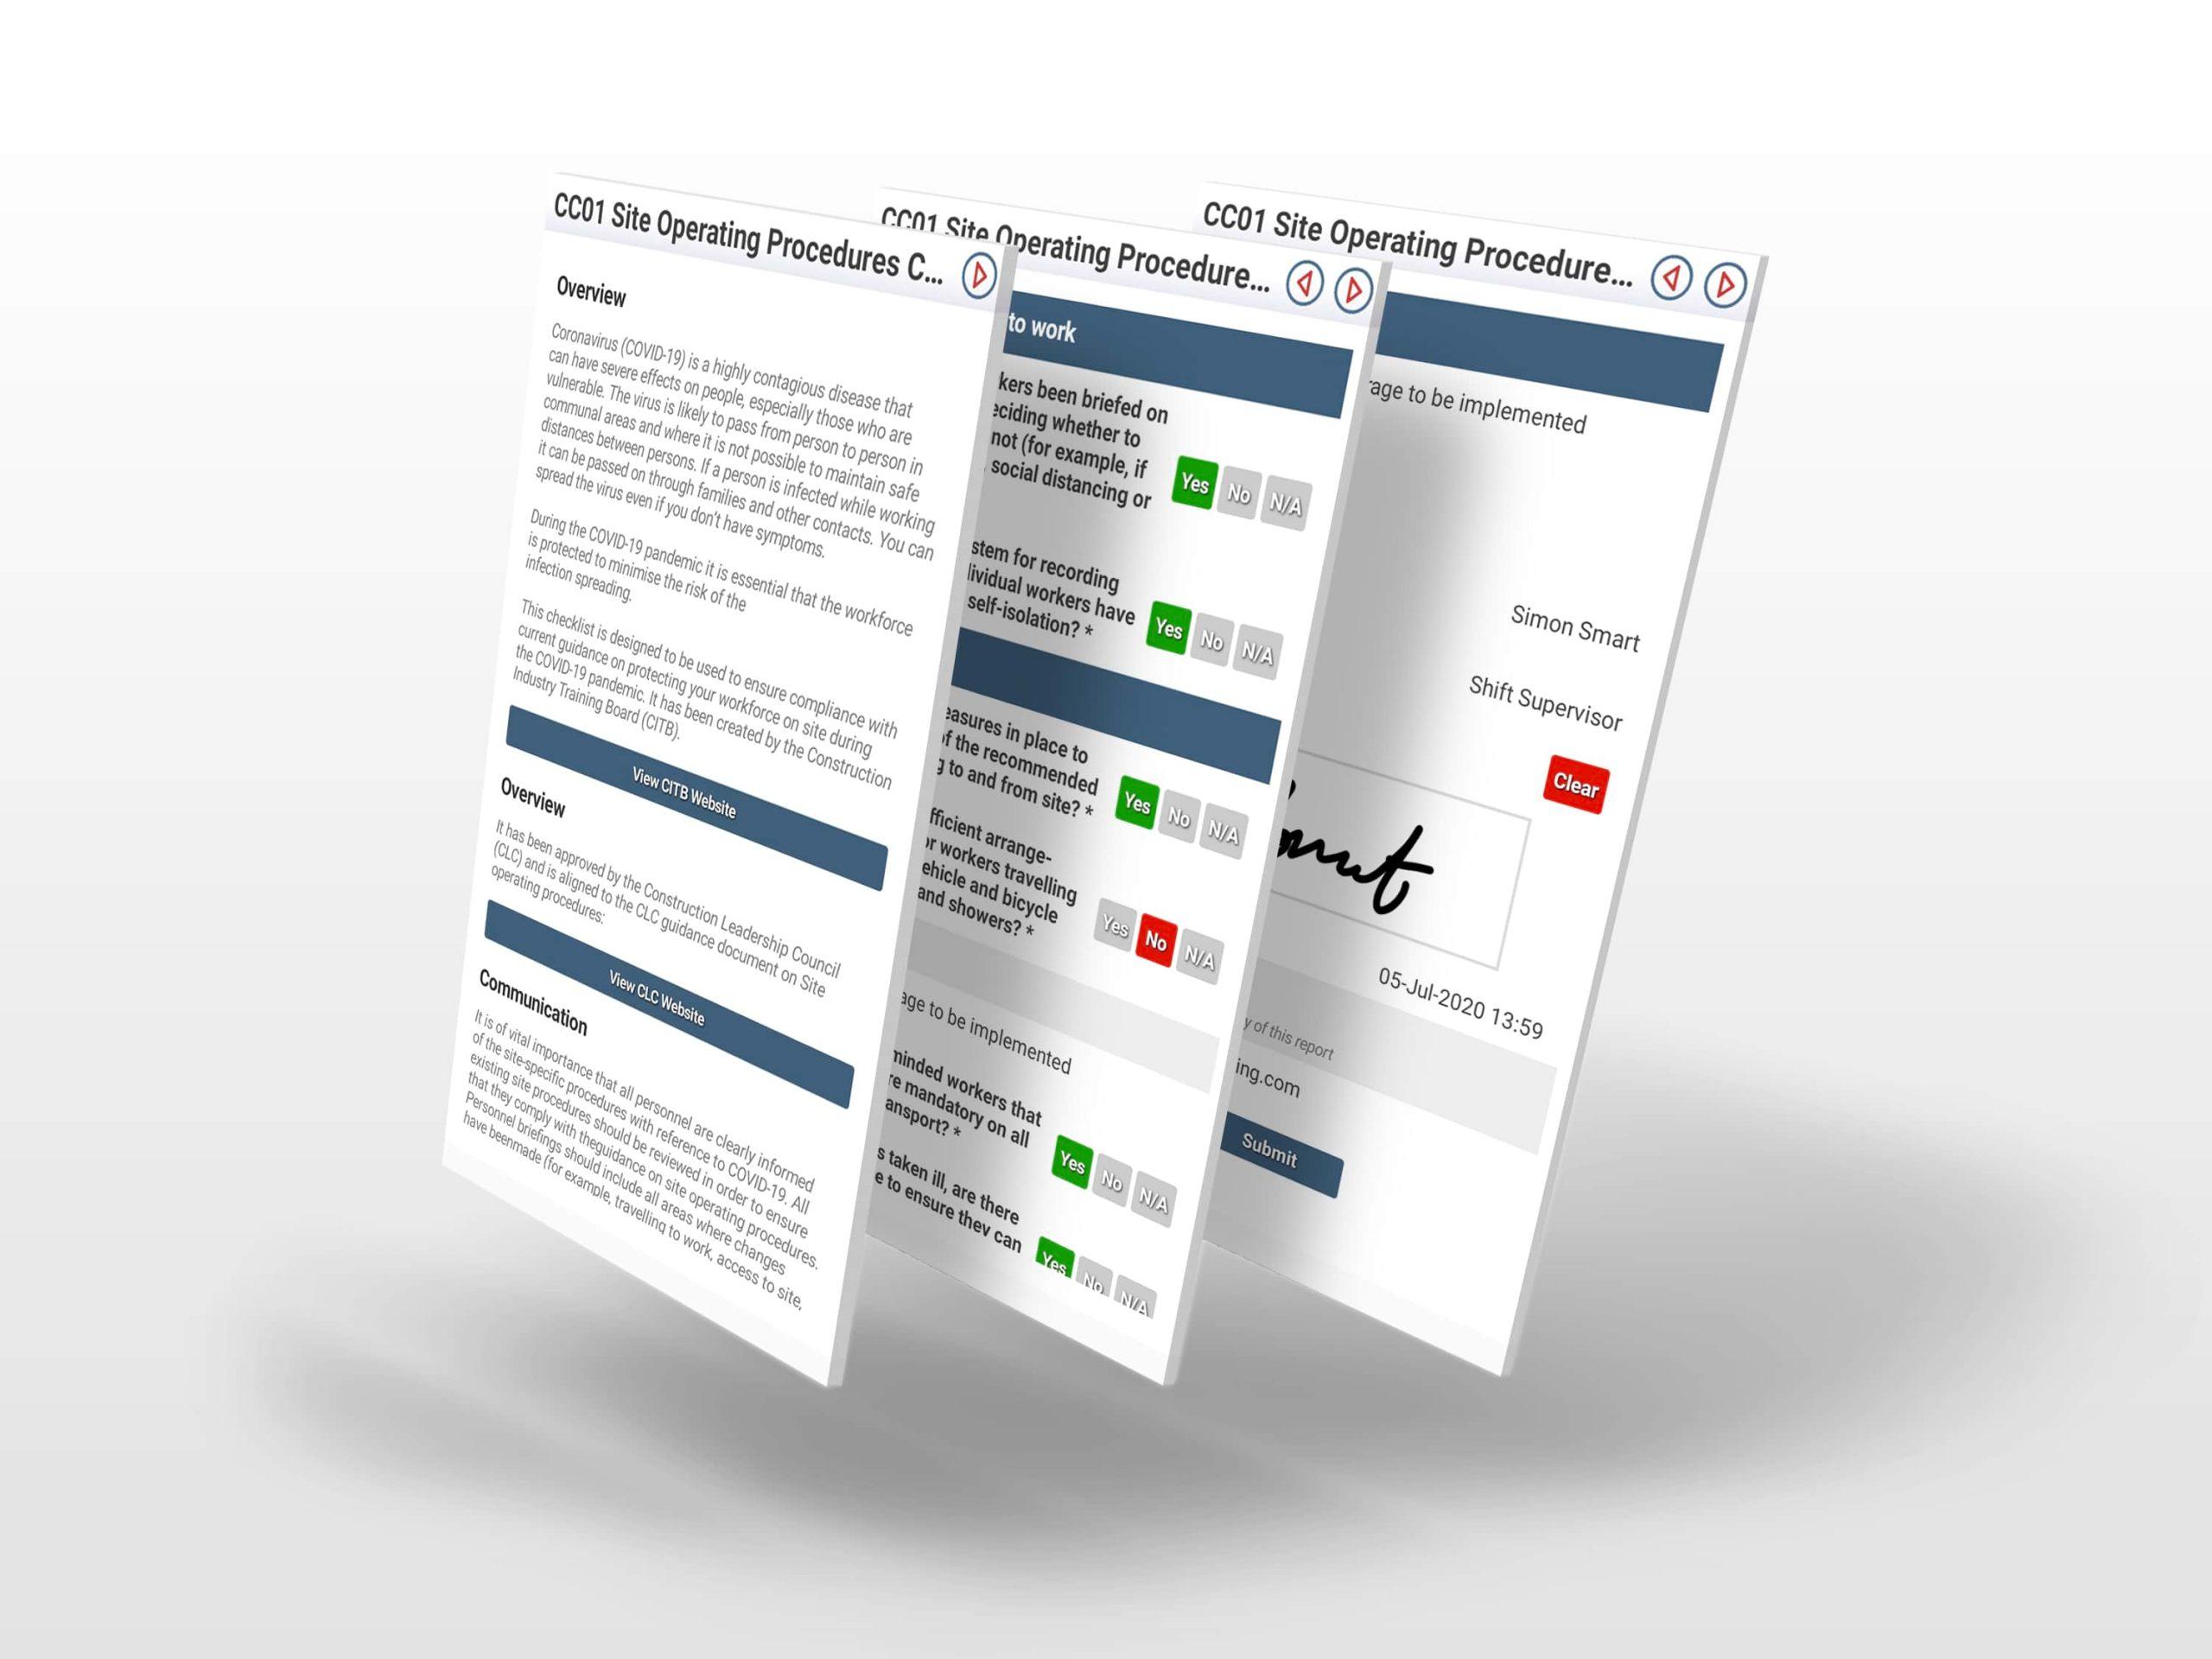 Site Operating Procedure Screenshots